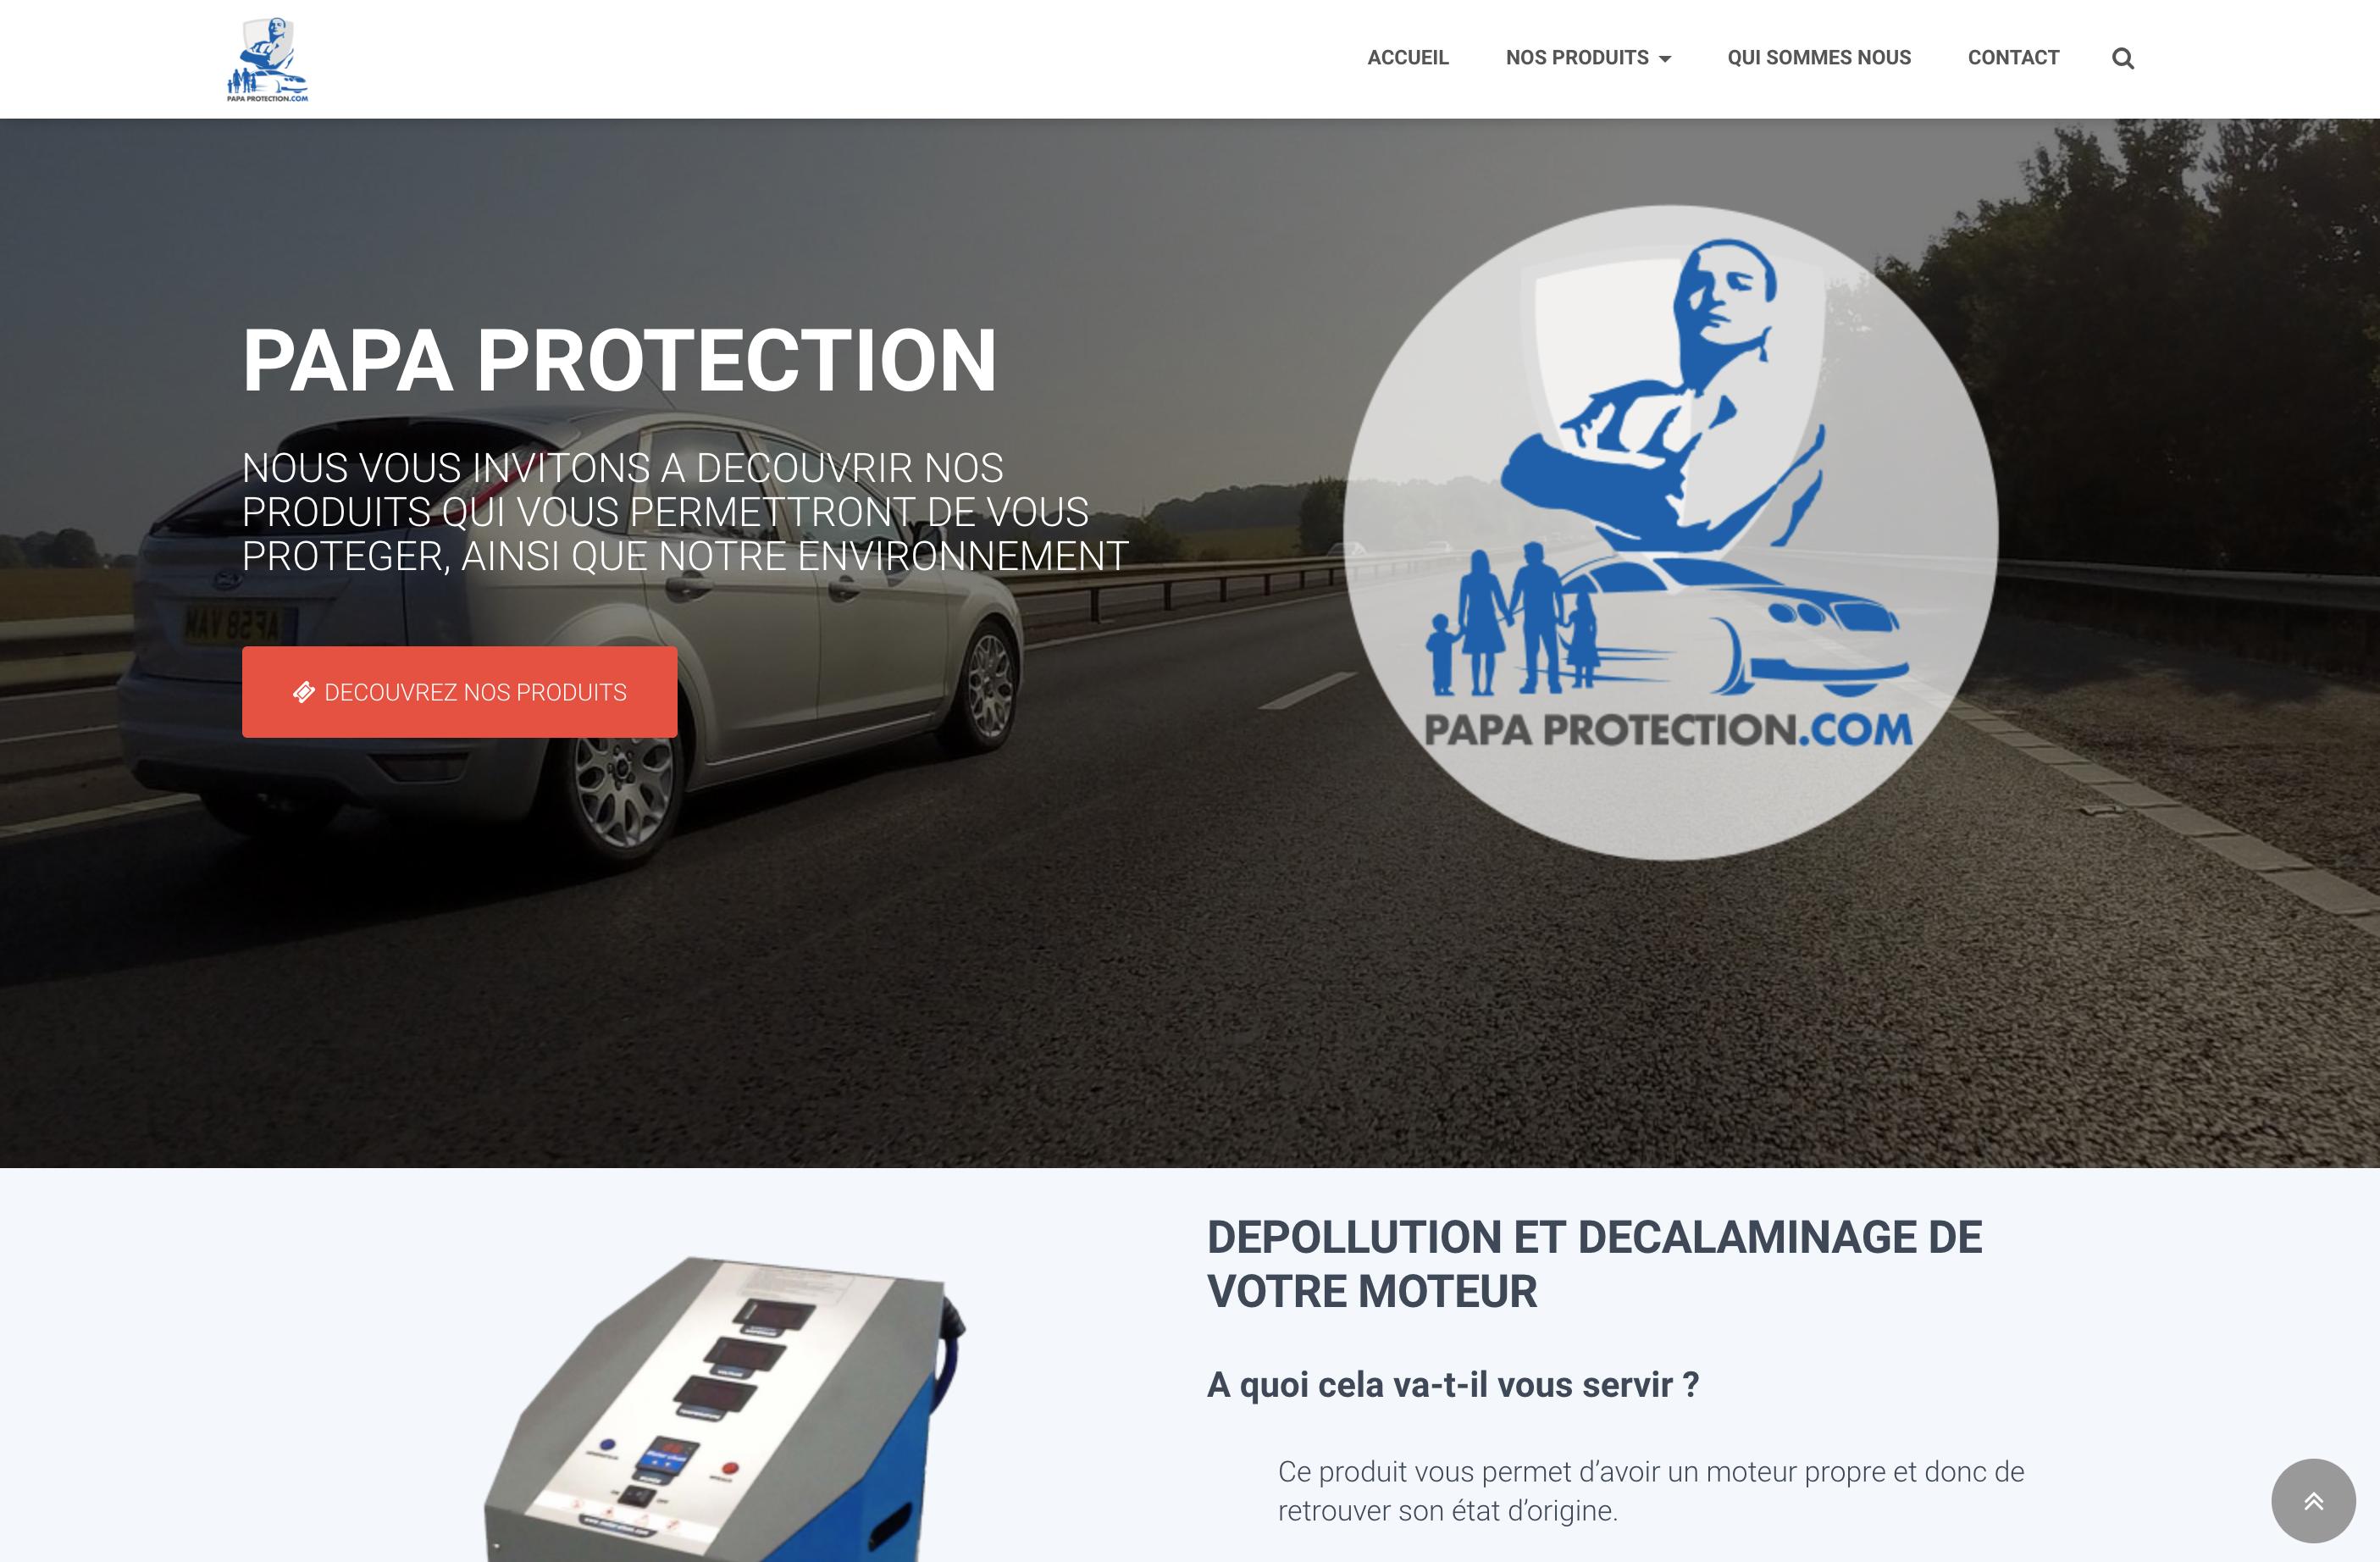 PAPA-PROTECTION.COM - création web arborescencia.net